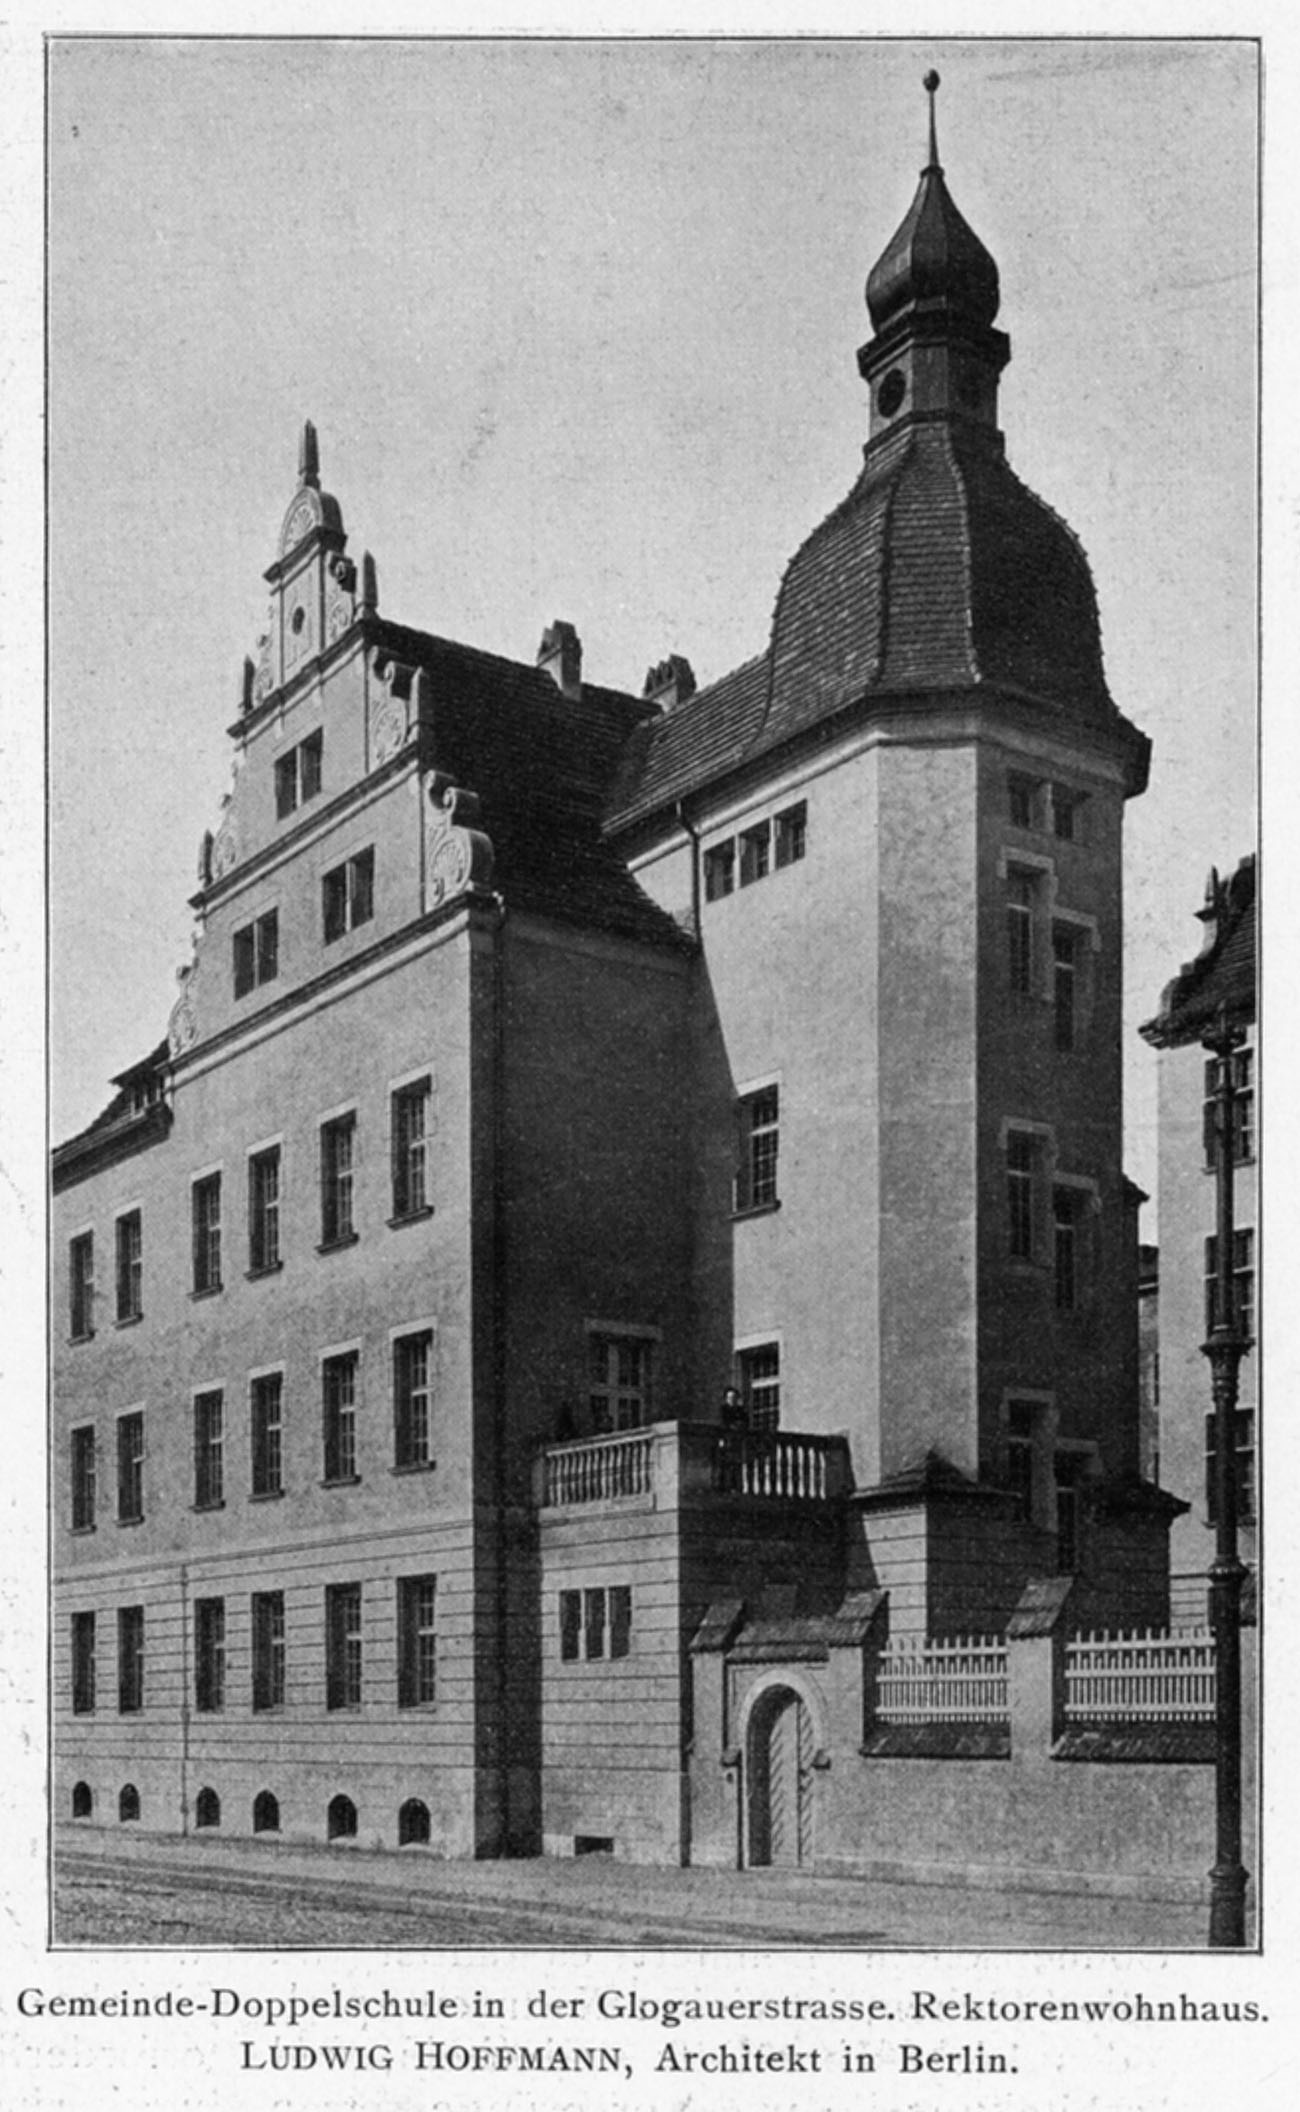 glogauer historic photo